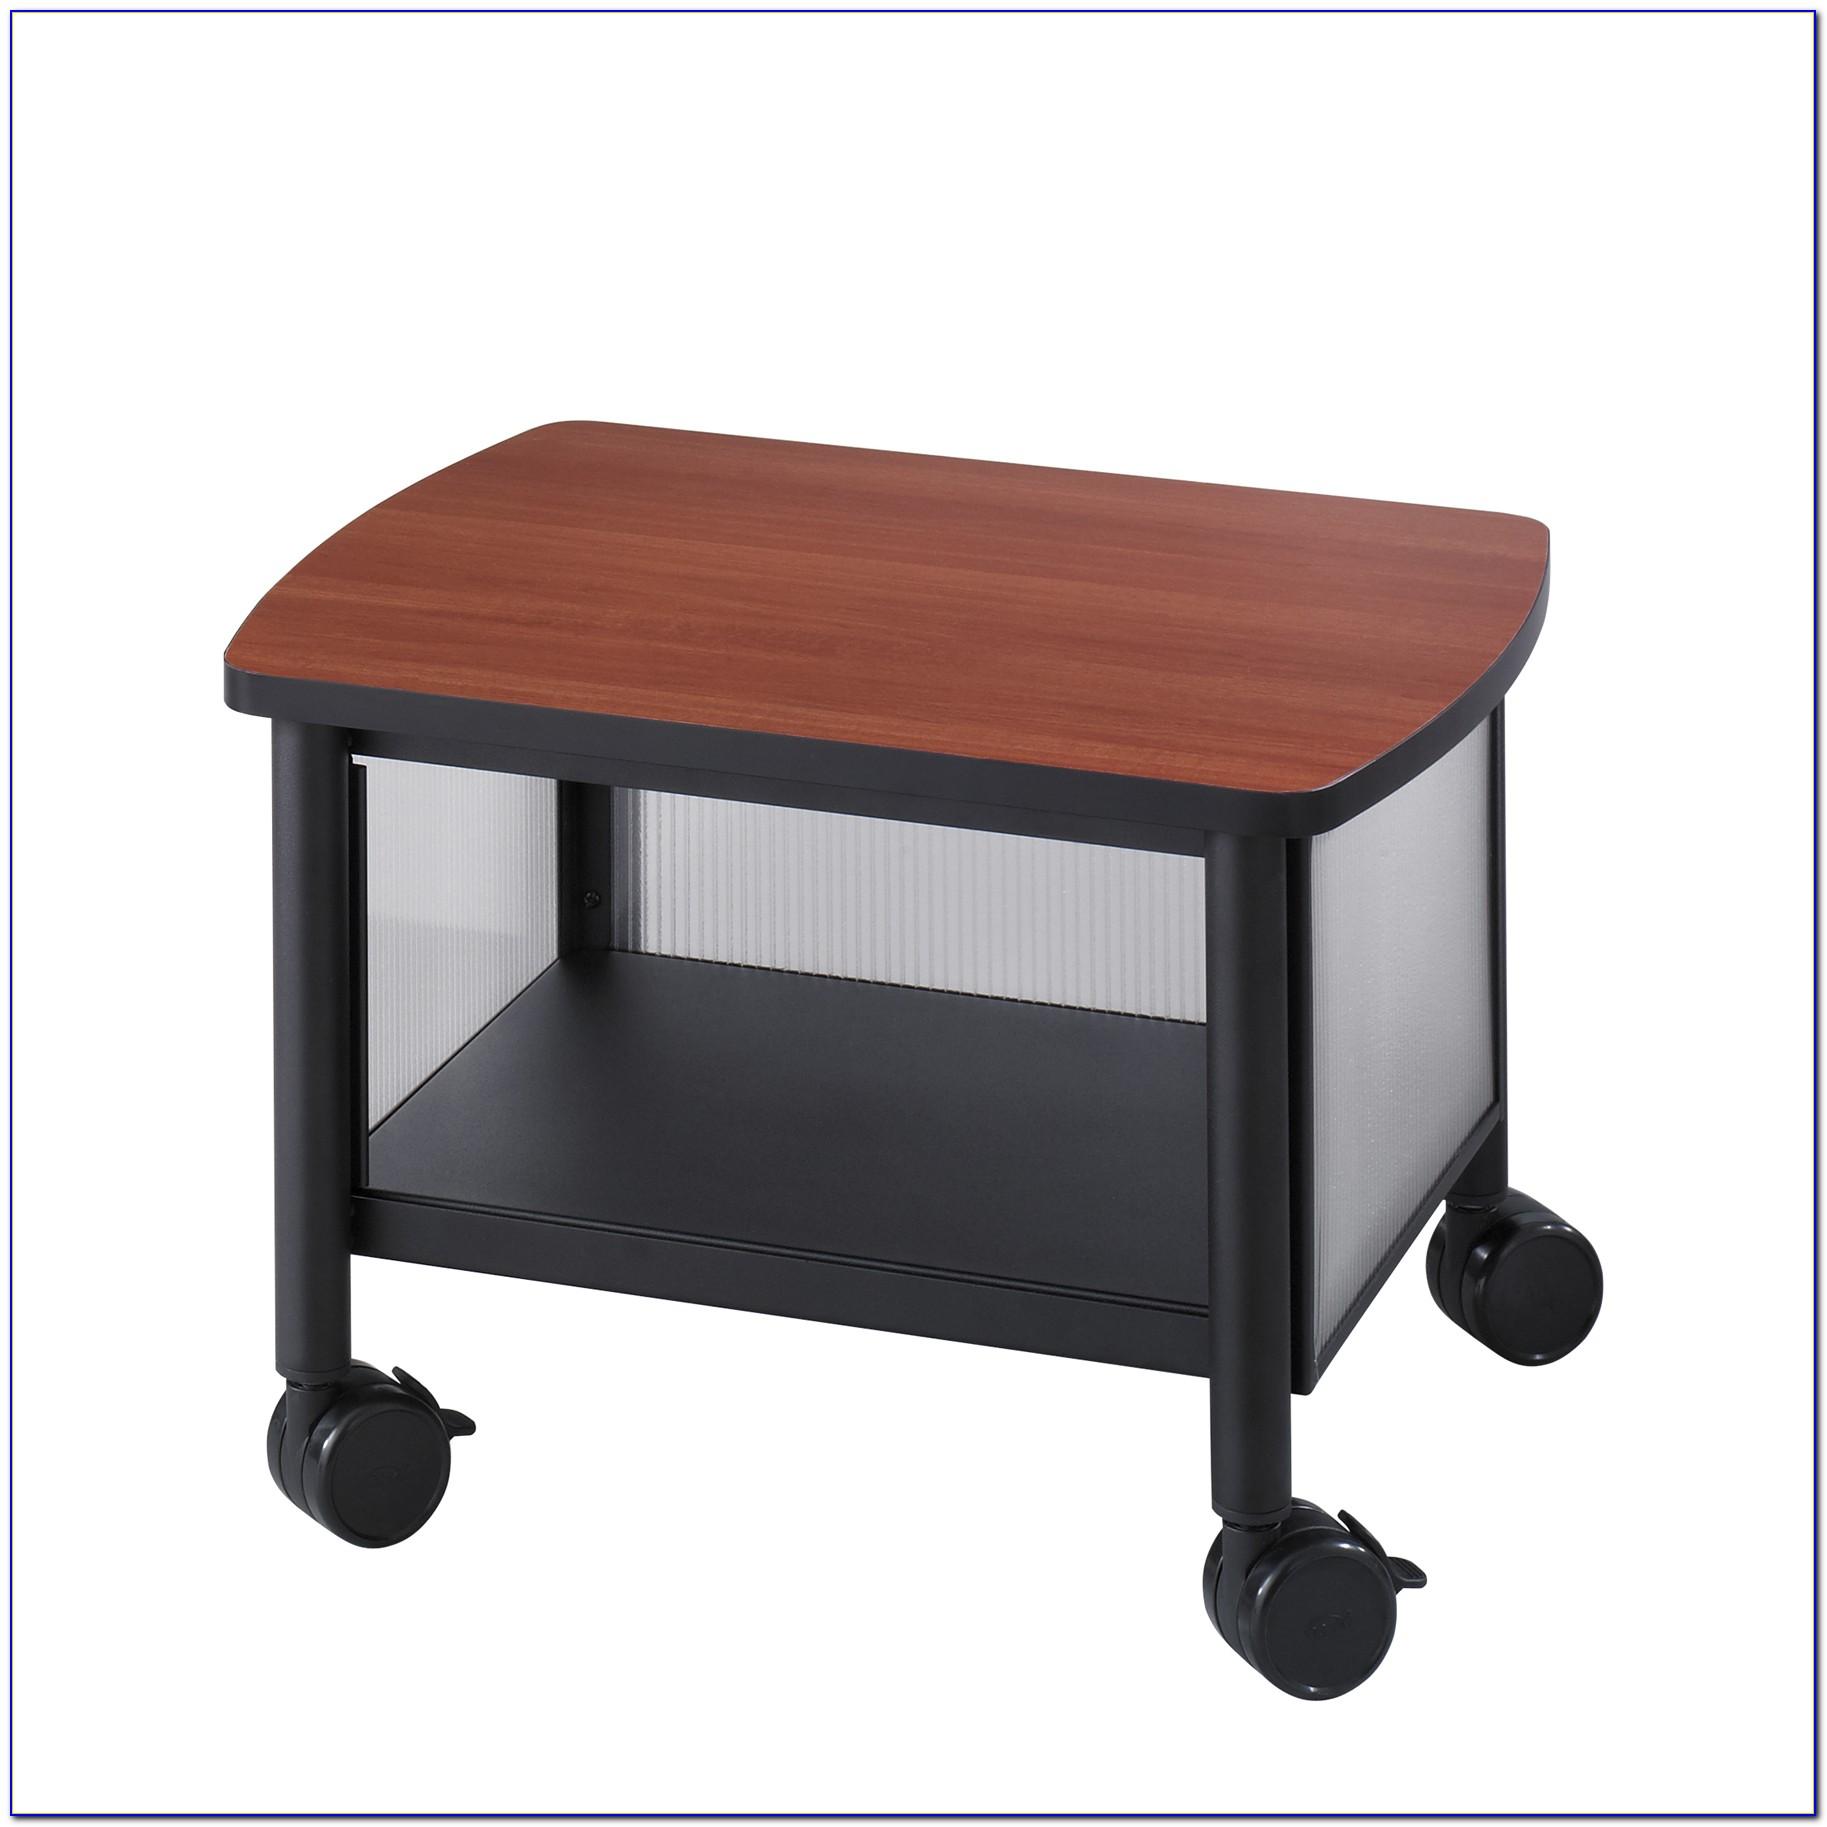 Under Desk Printer Stands